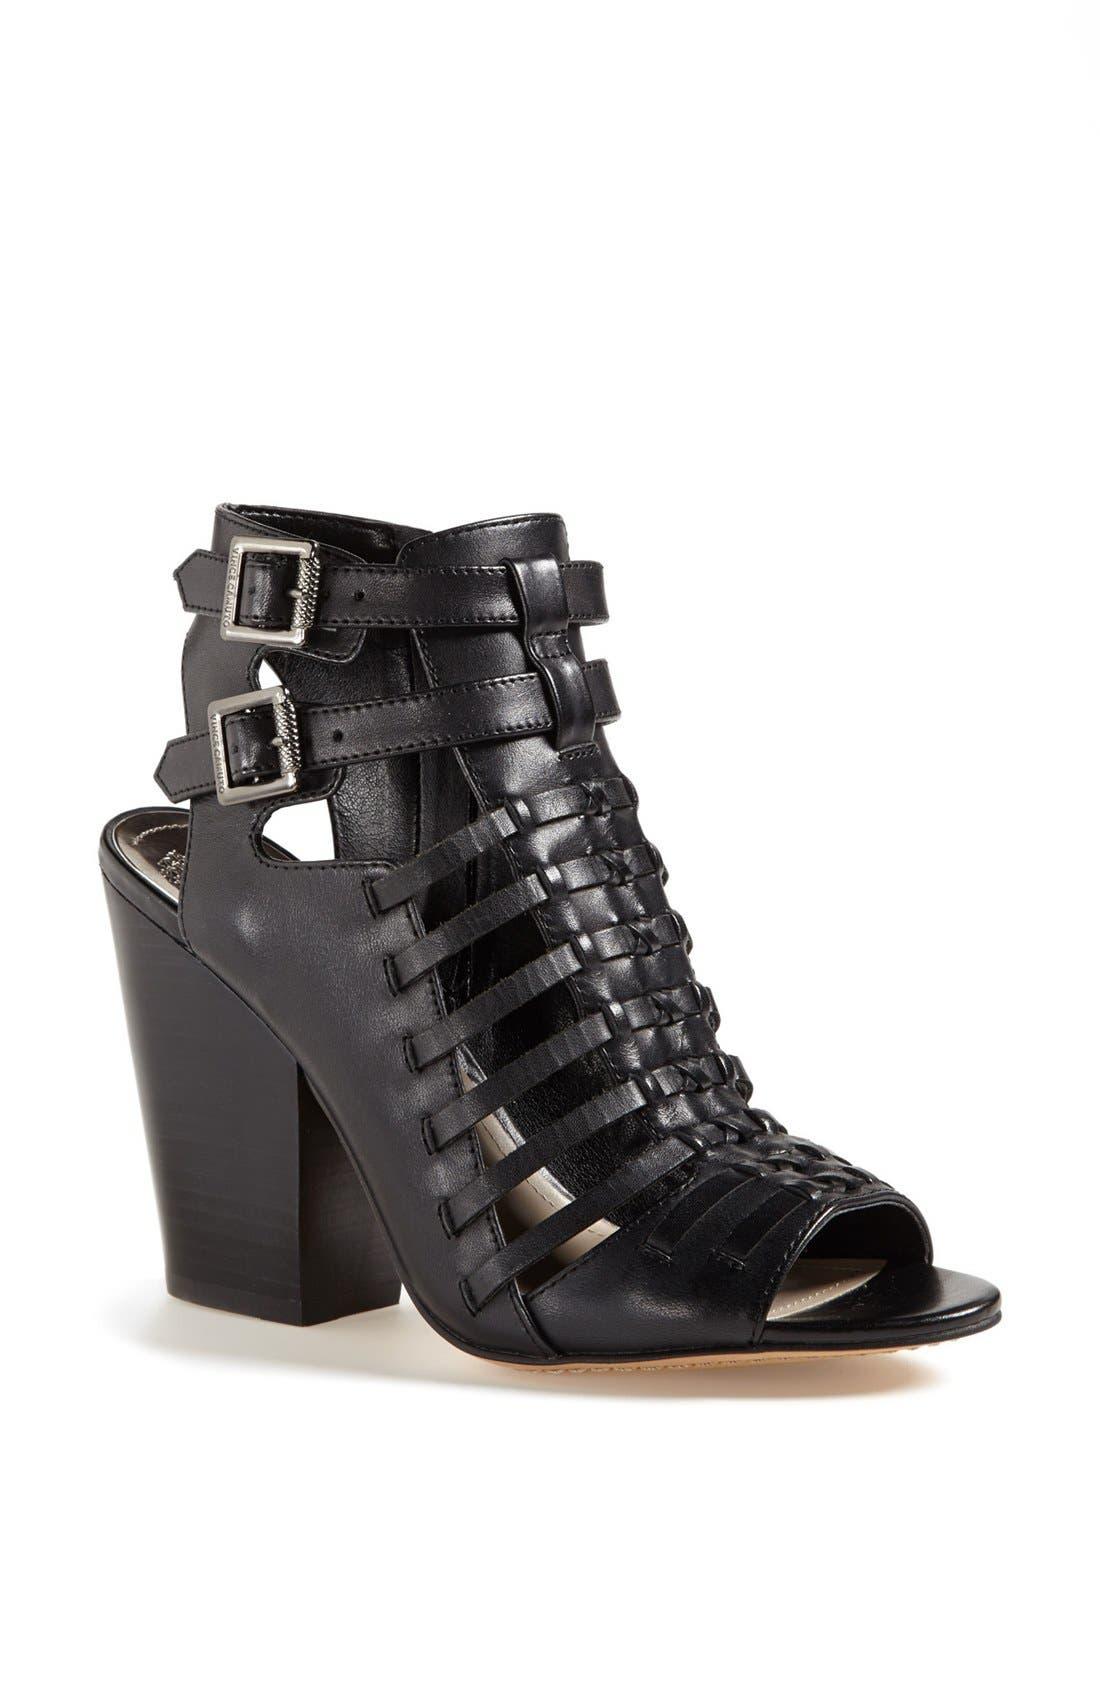 Main Image - Vince Camuto 'Medow' Sandal